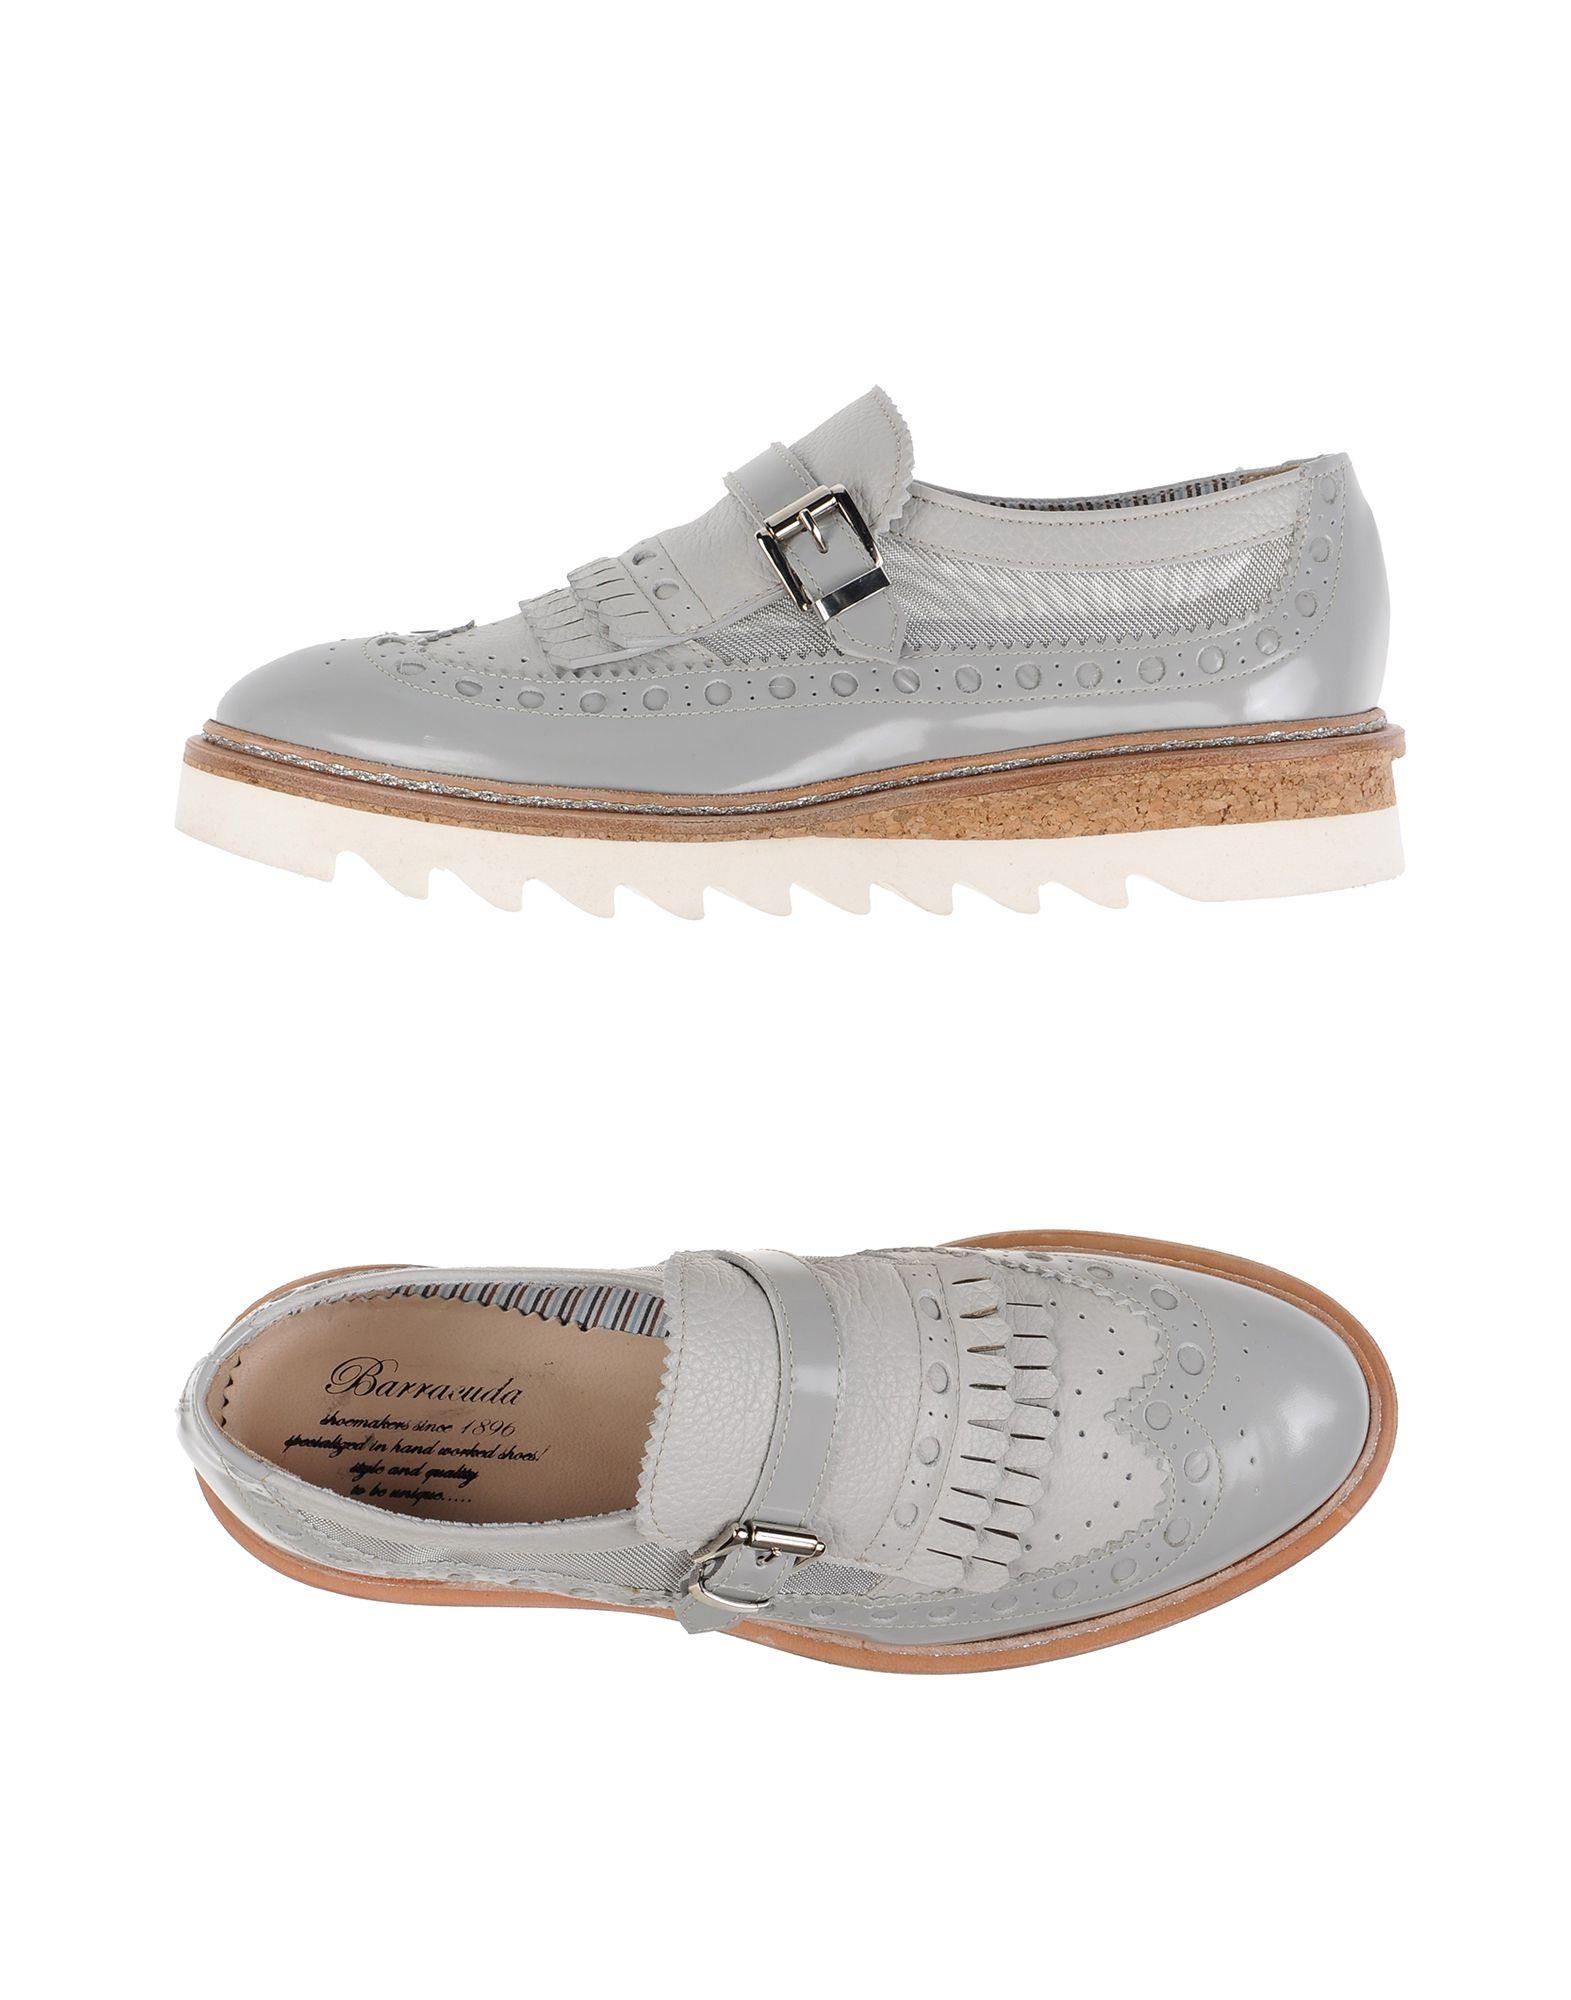 Rabatt Schuhe Barracuda Mokassins Damen  11154389CQ